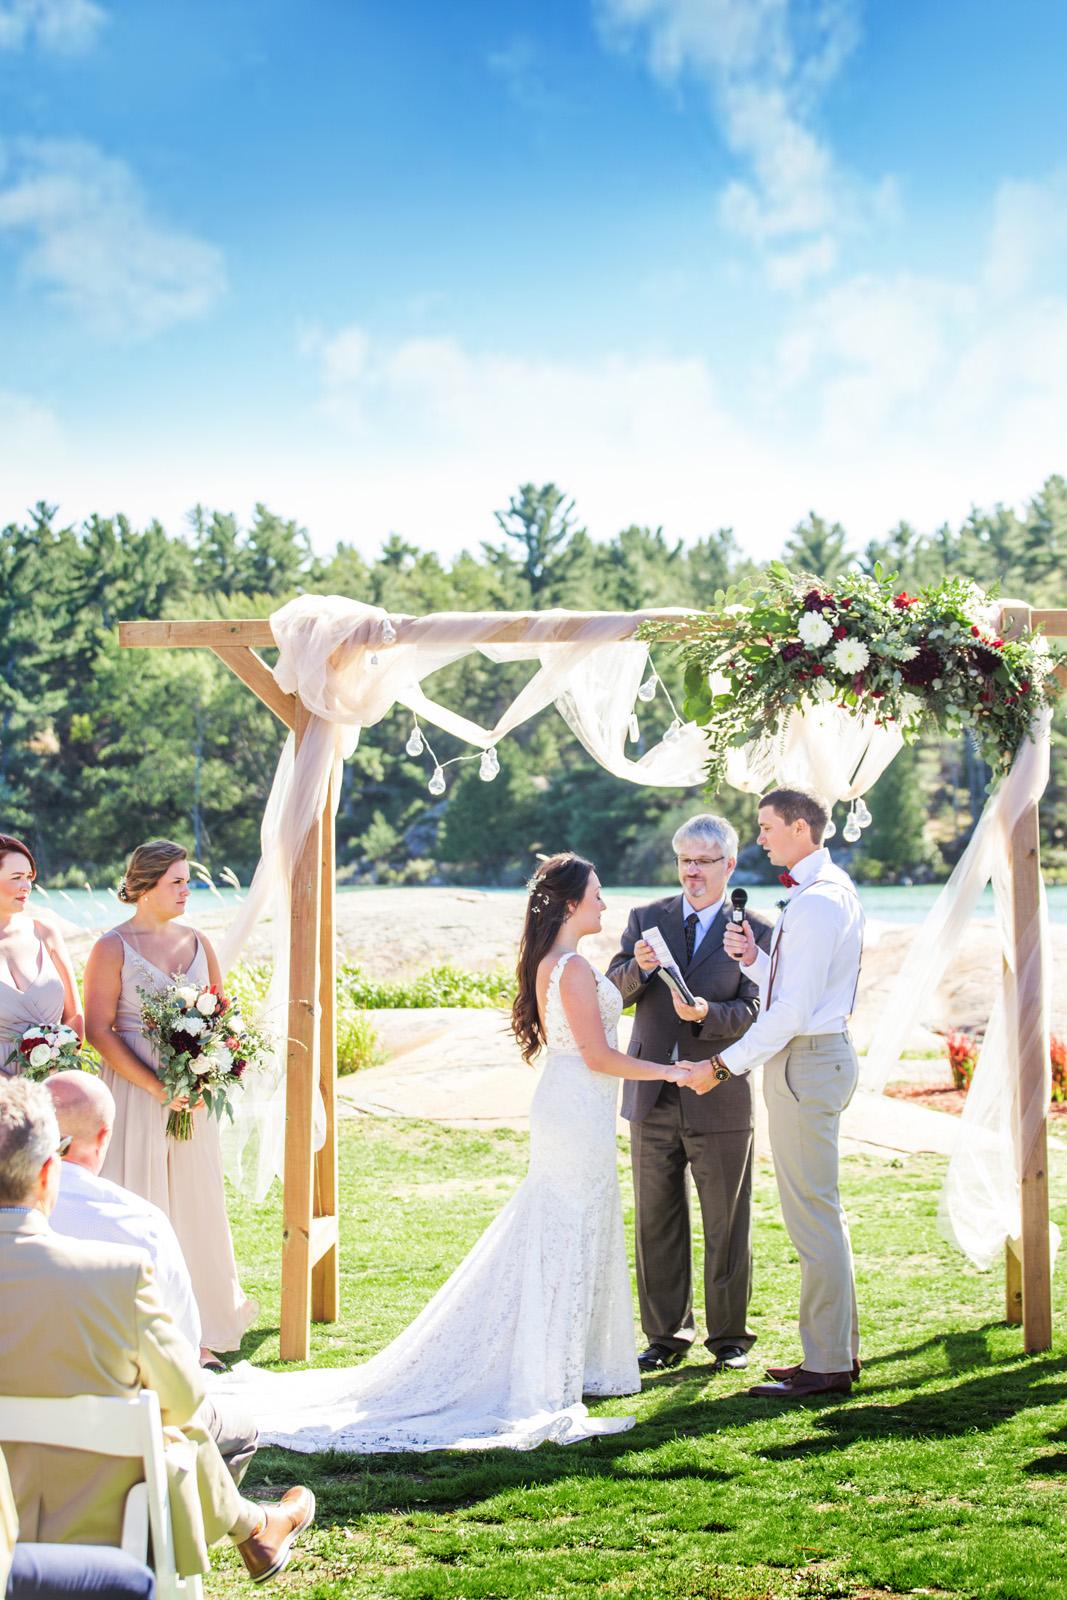 harris_wedding-1700.jpg